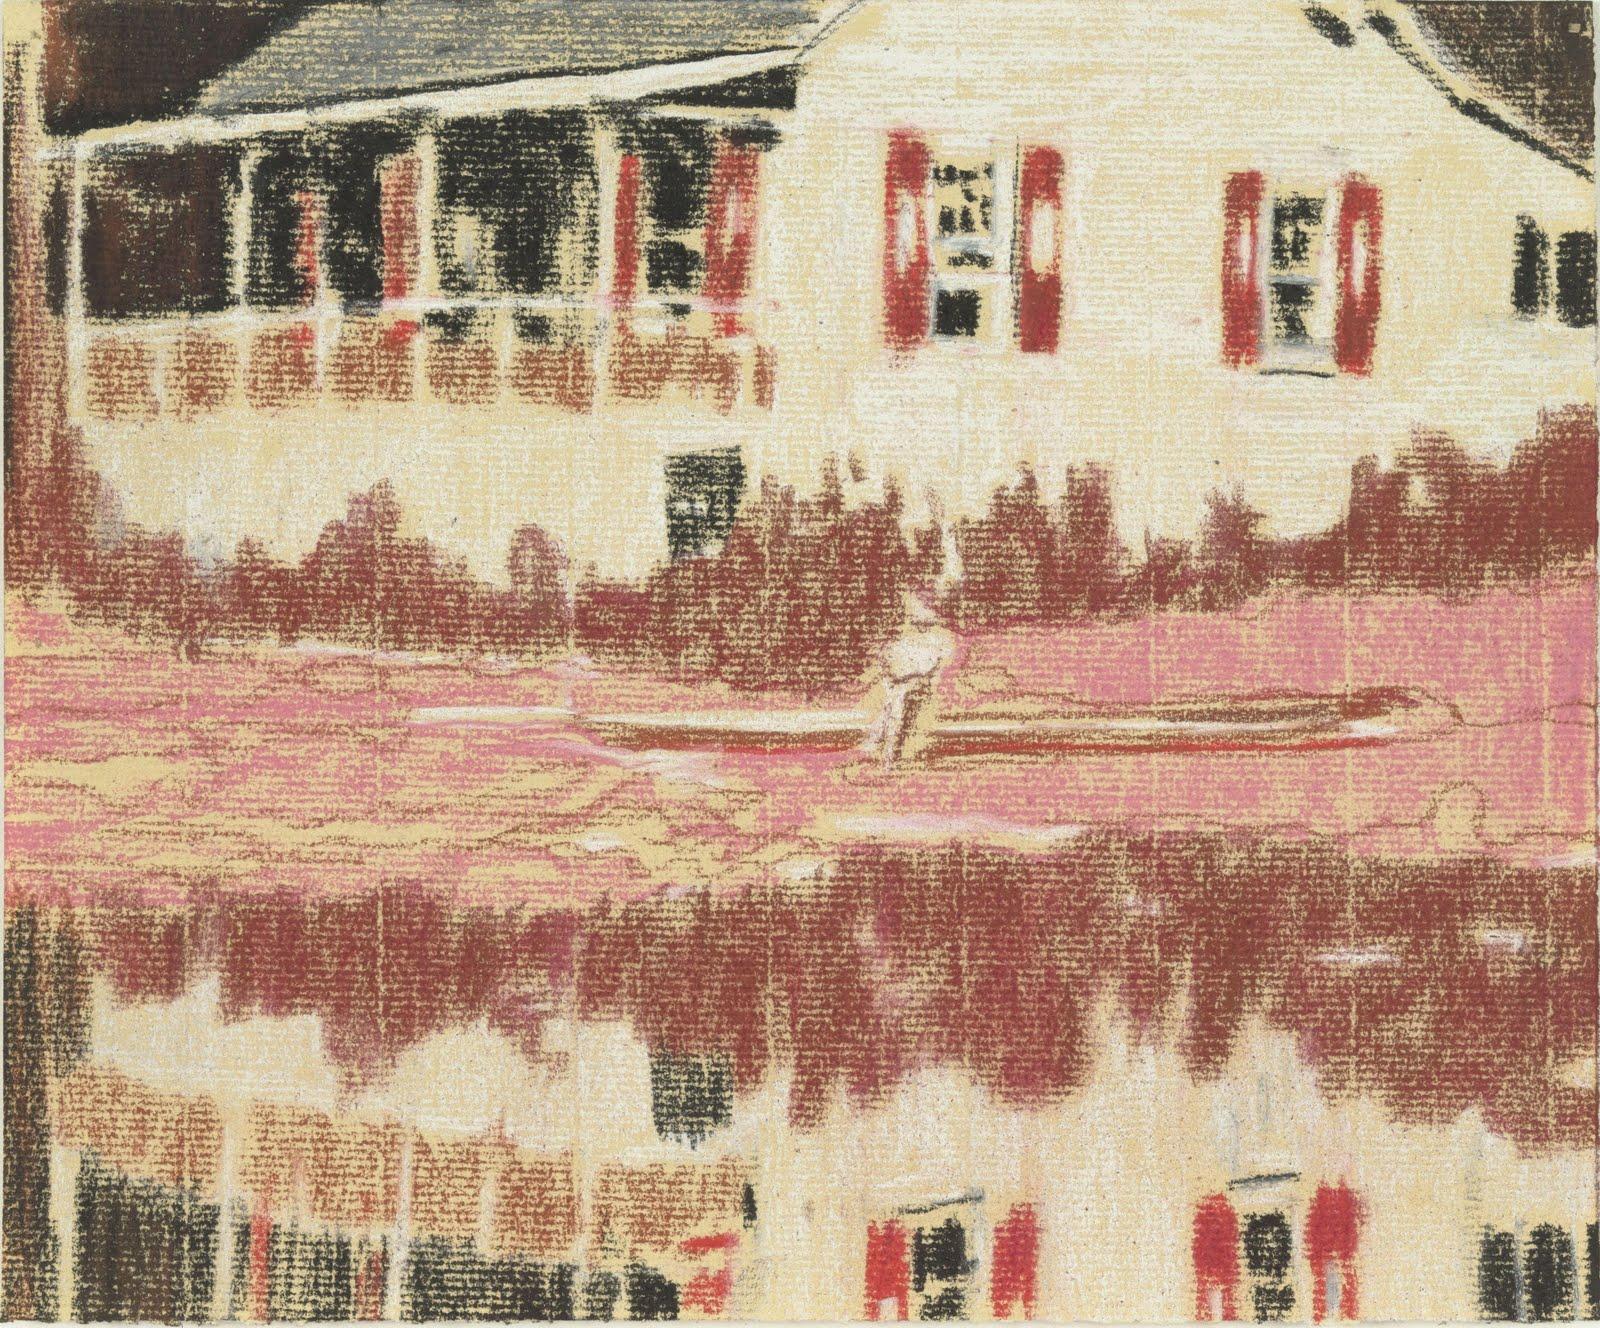 St Martins School >> The Art History Journal: Peter Doig